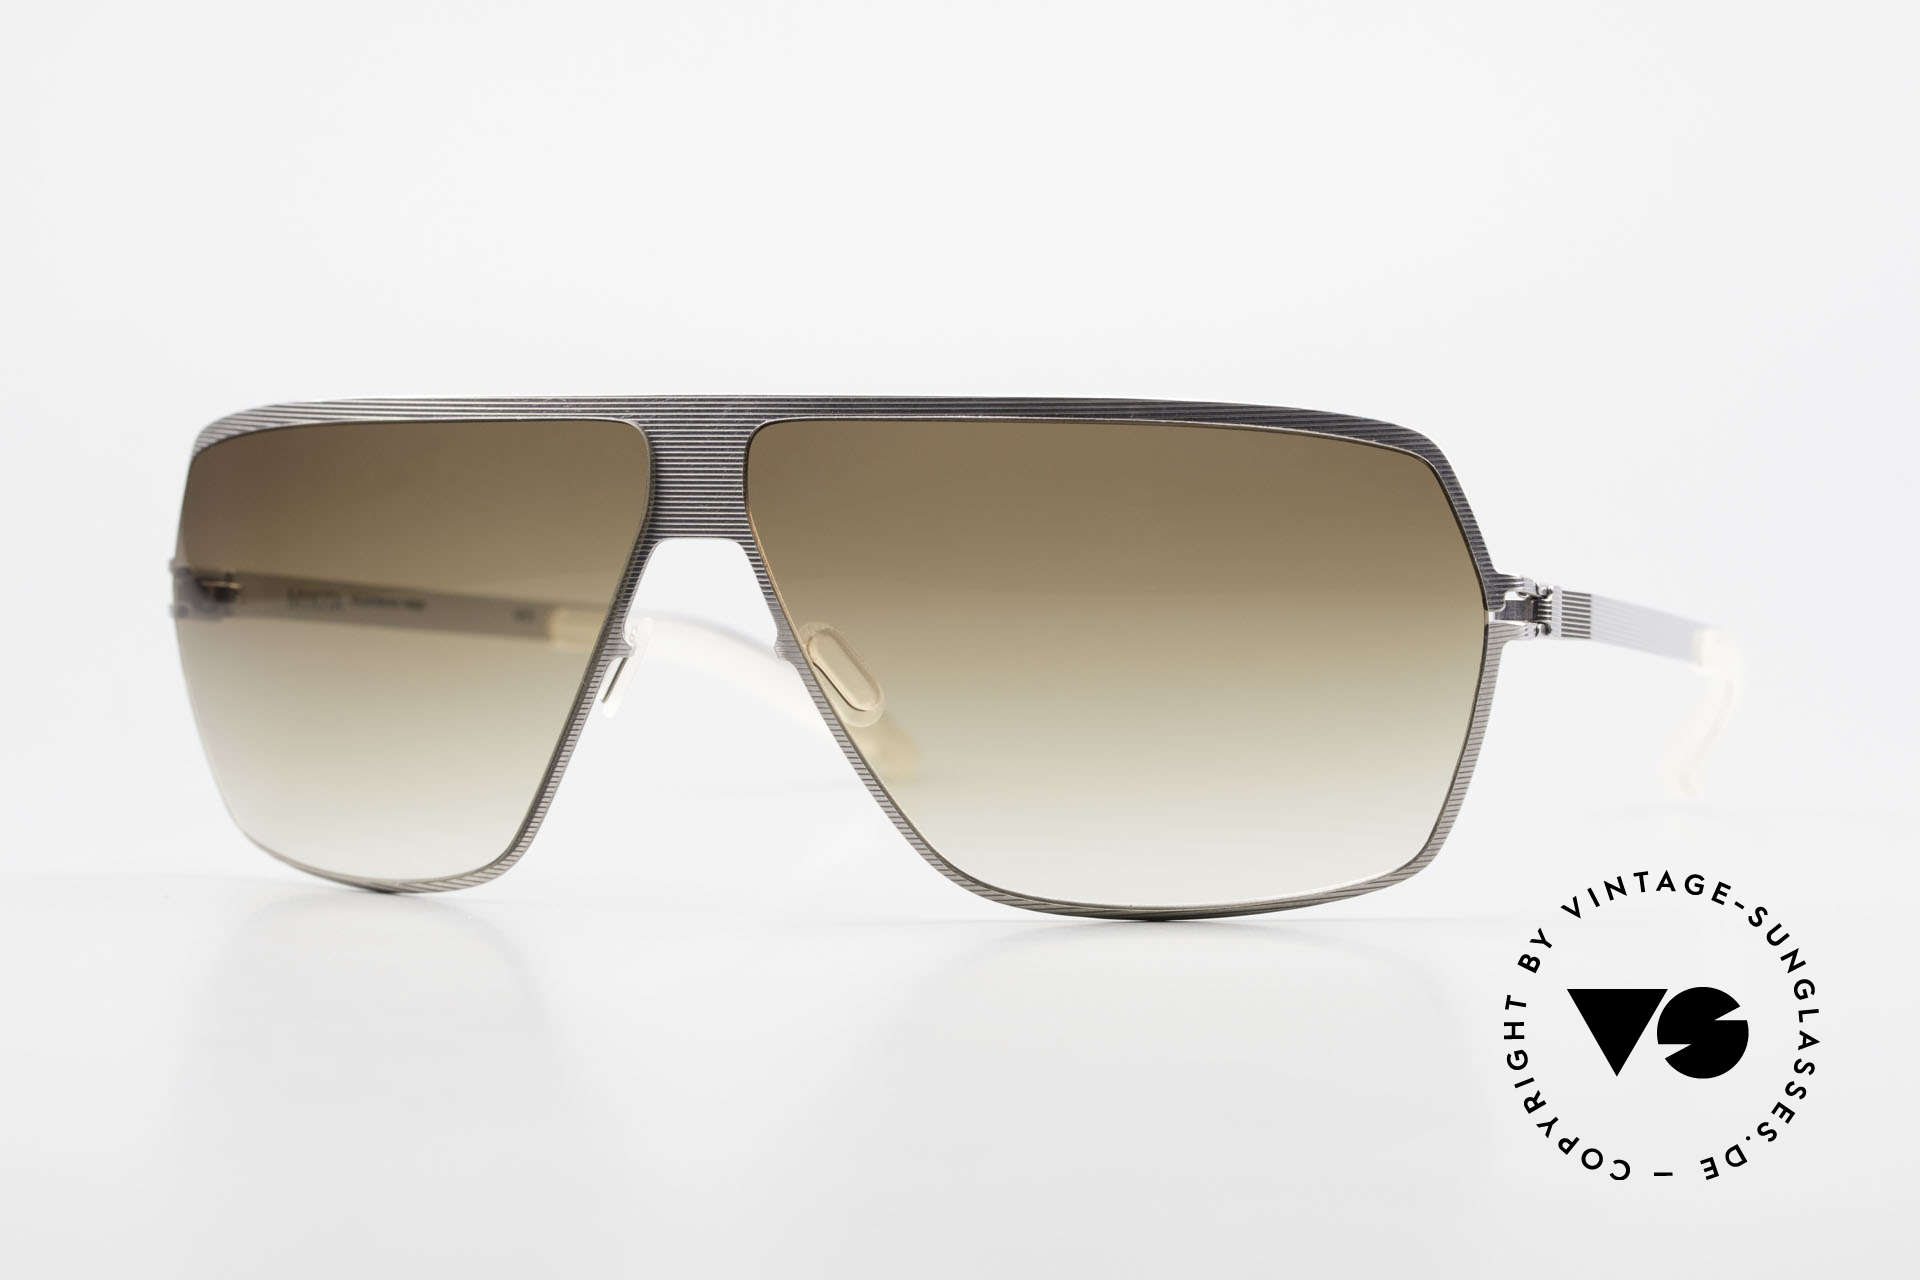 Mykita Rock No1 Collection Sunglasses 2009, original VINTAGE MYKITA men's sunglasses from 2009, Made for Men